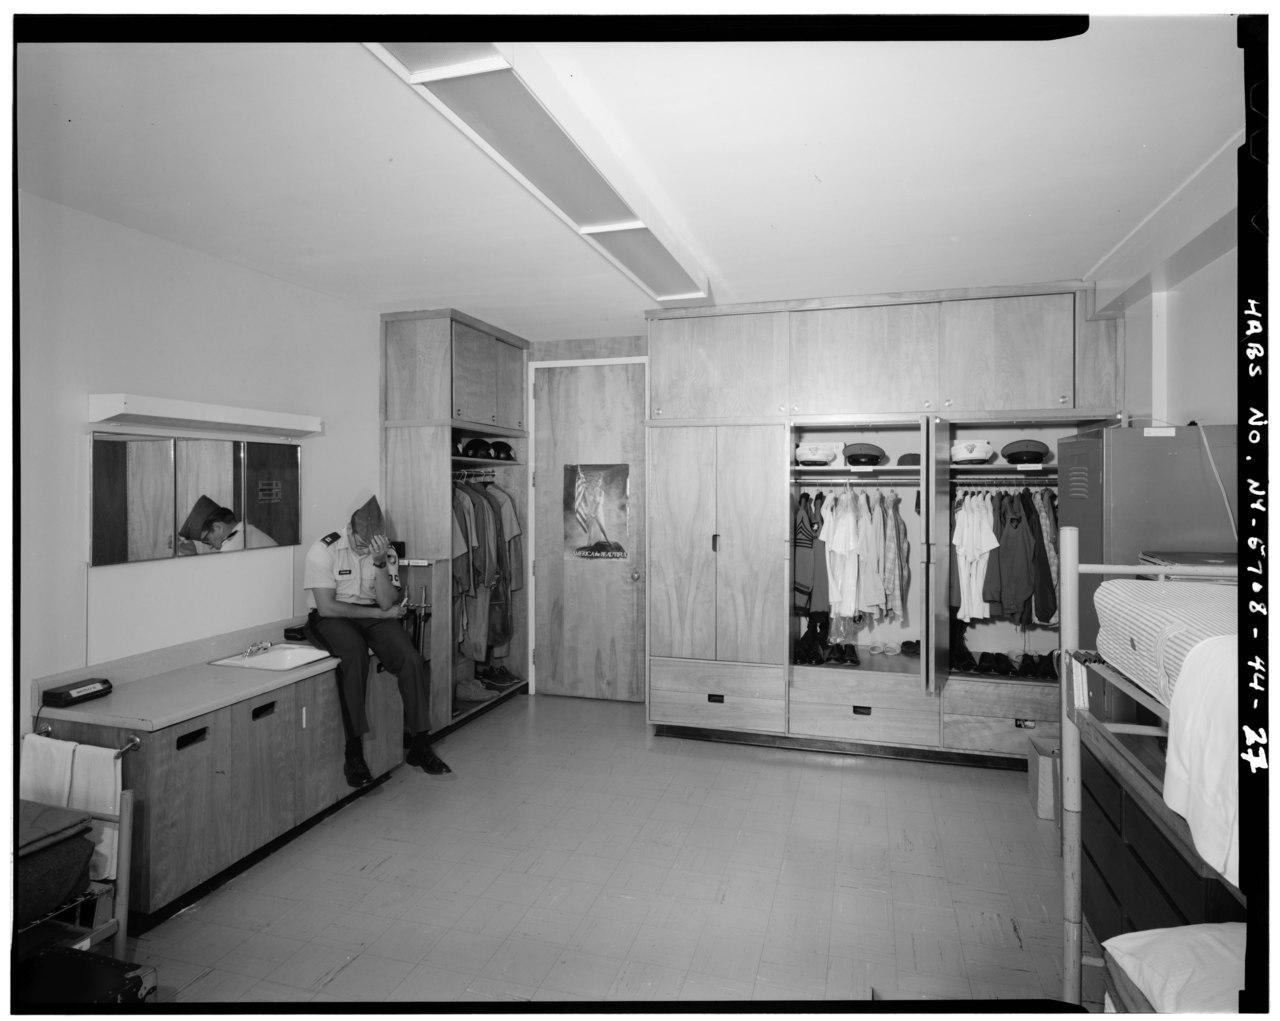 File:INTERIOR VIEW OF MODERN ROOM, EISENHOWER BARRACKS - U ...